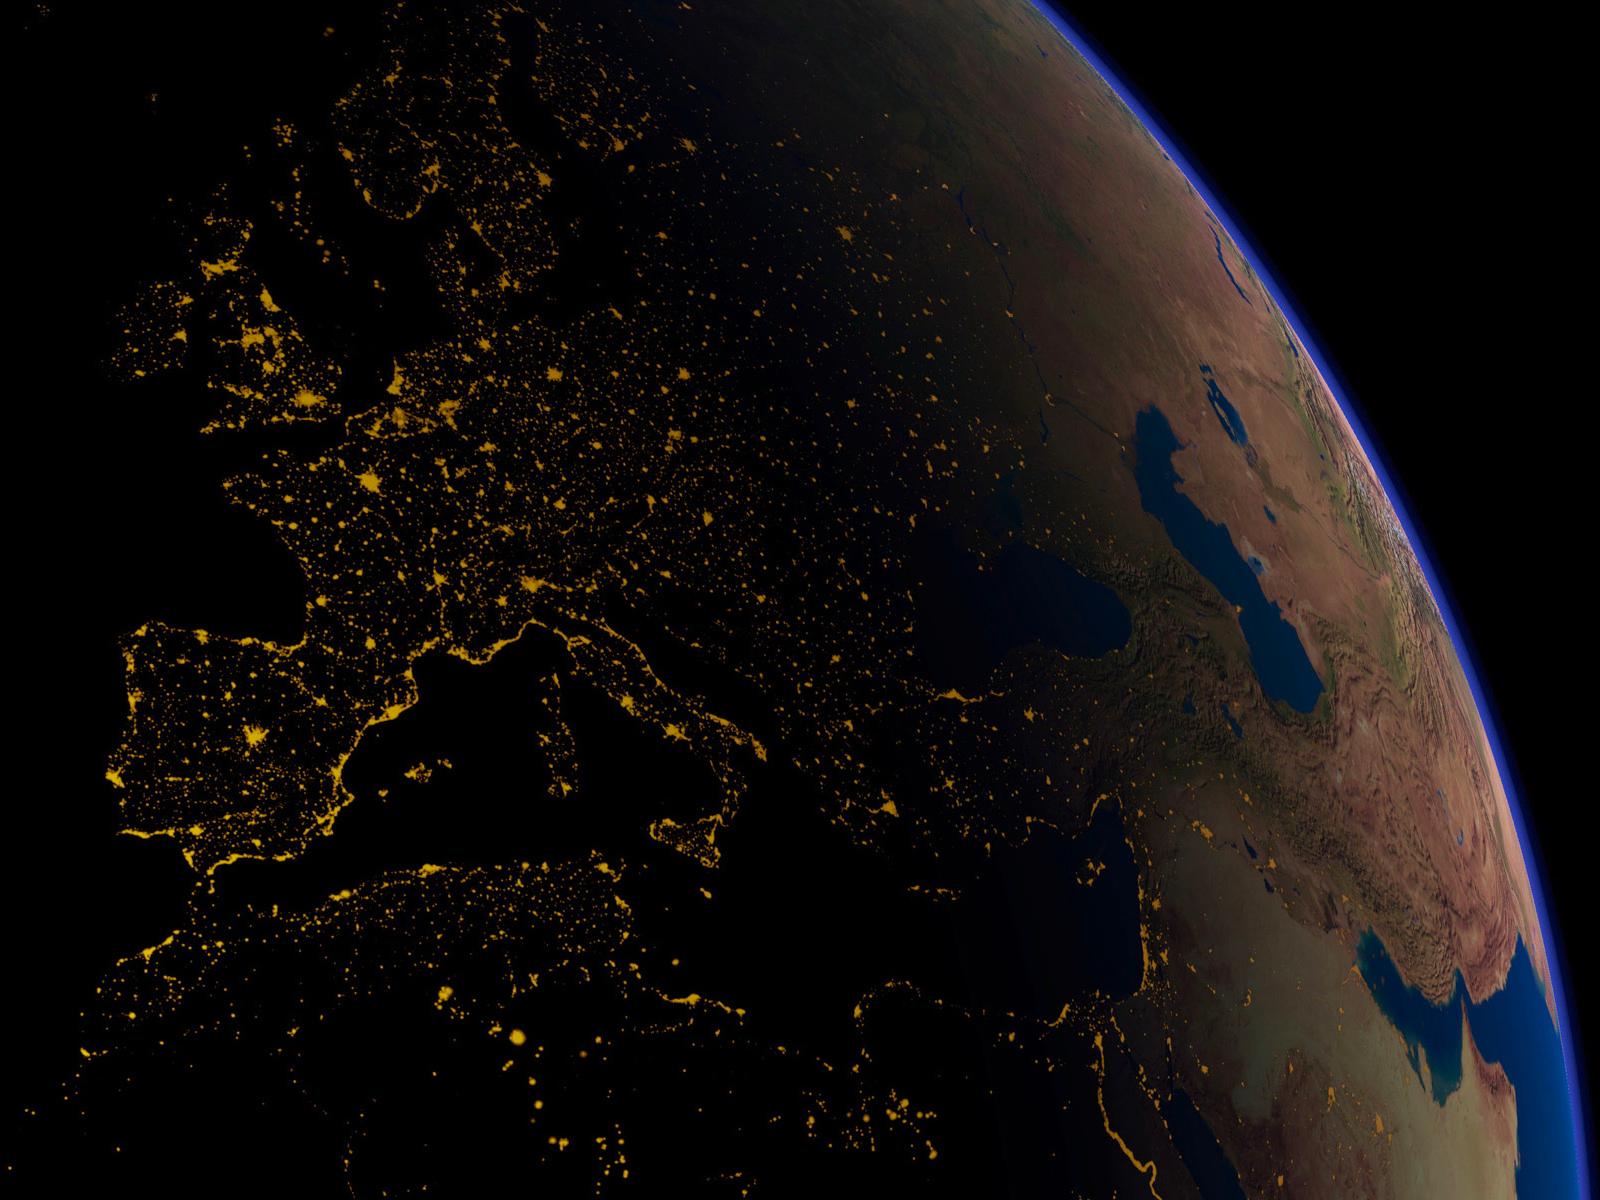 Earth at night wallpapers Earth at night stock photos 1600x1200